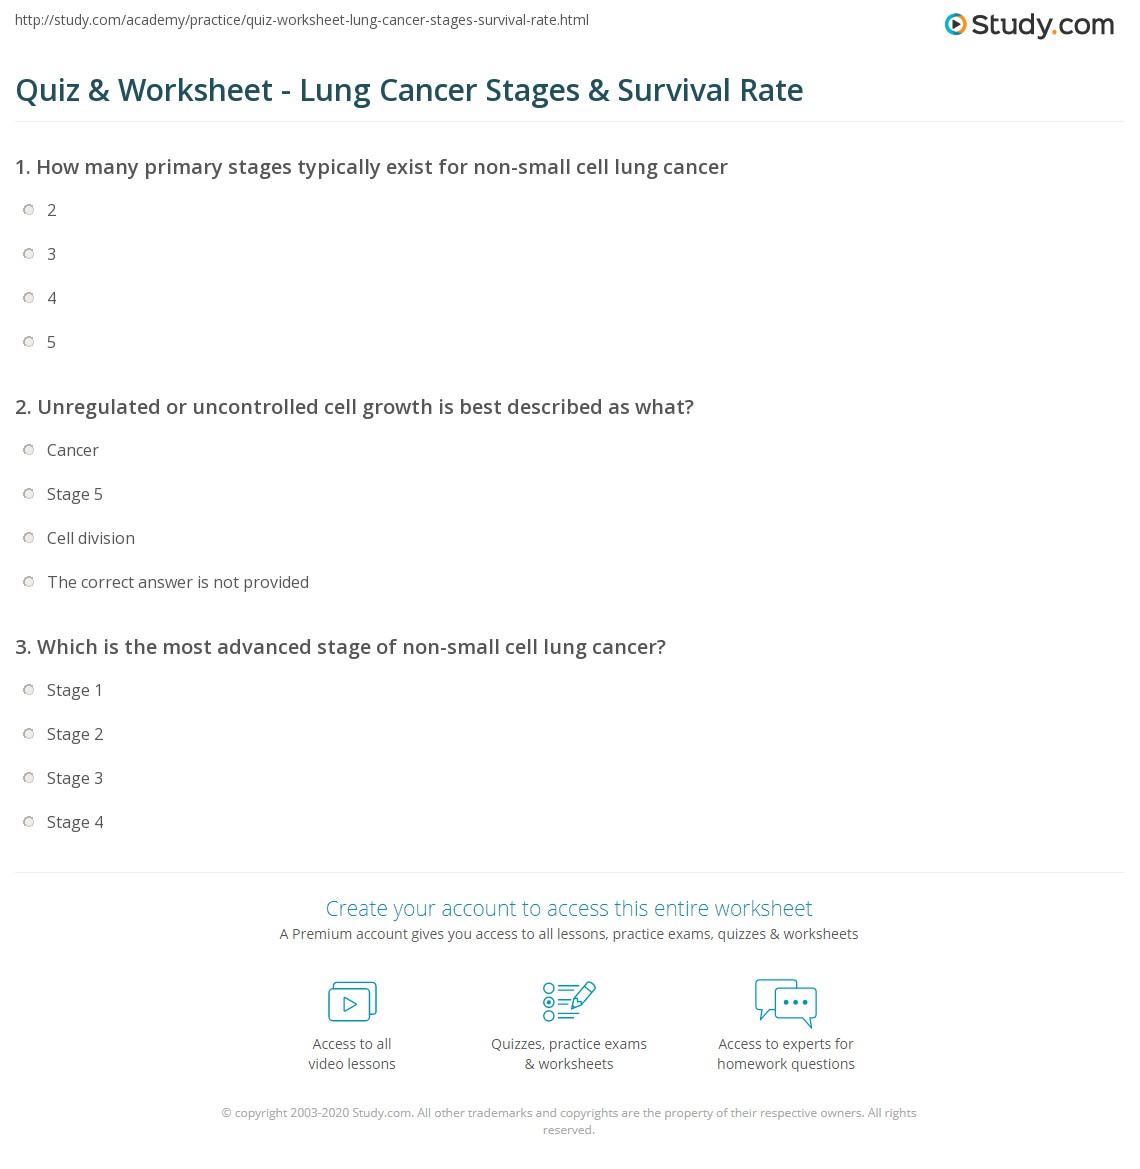 Quiz & Worksheet - Lung Cancer Stages & Survival Rate